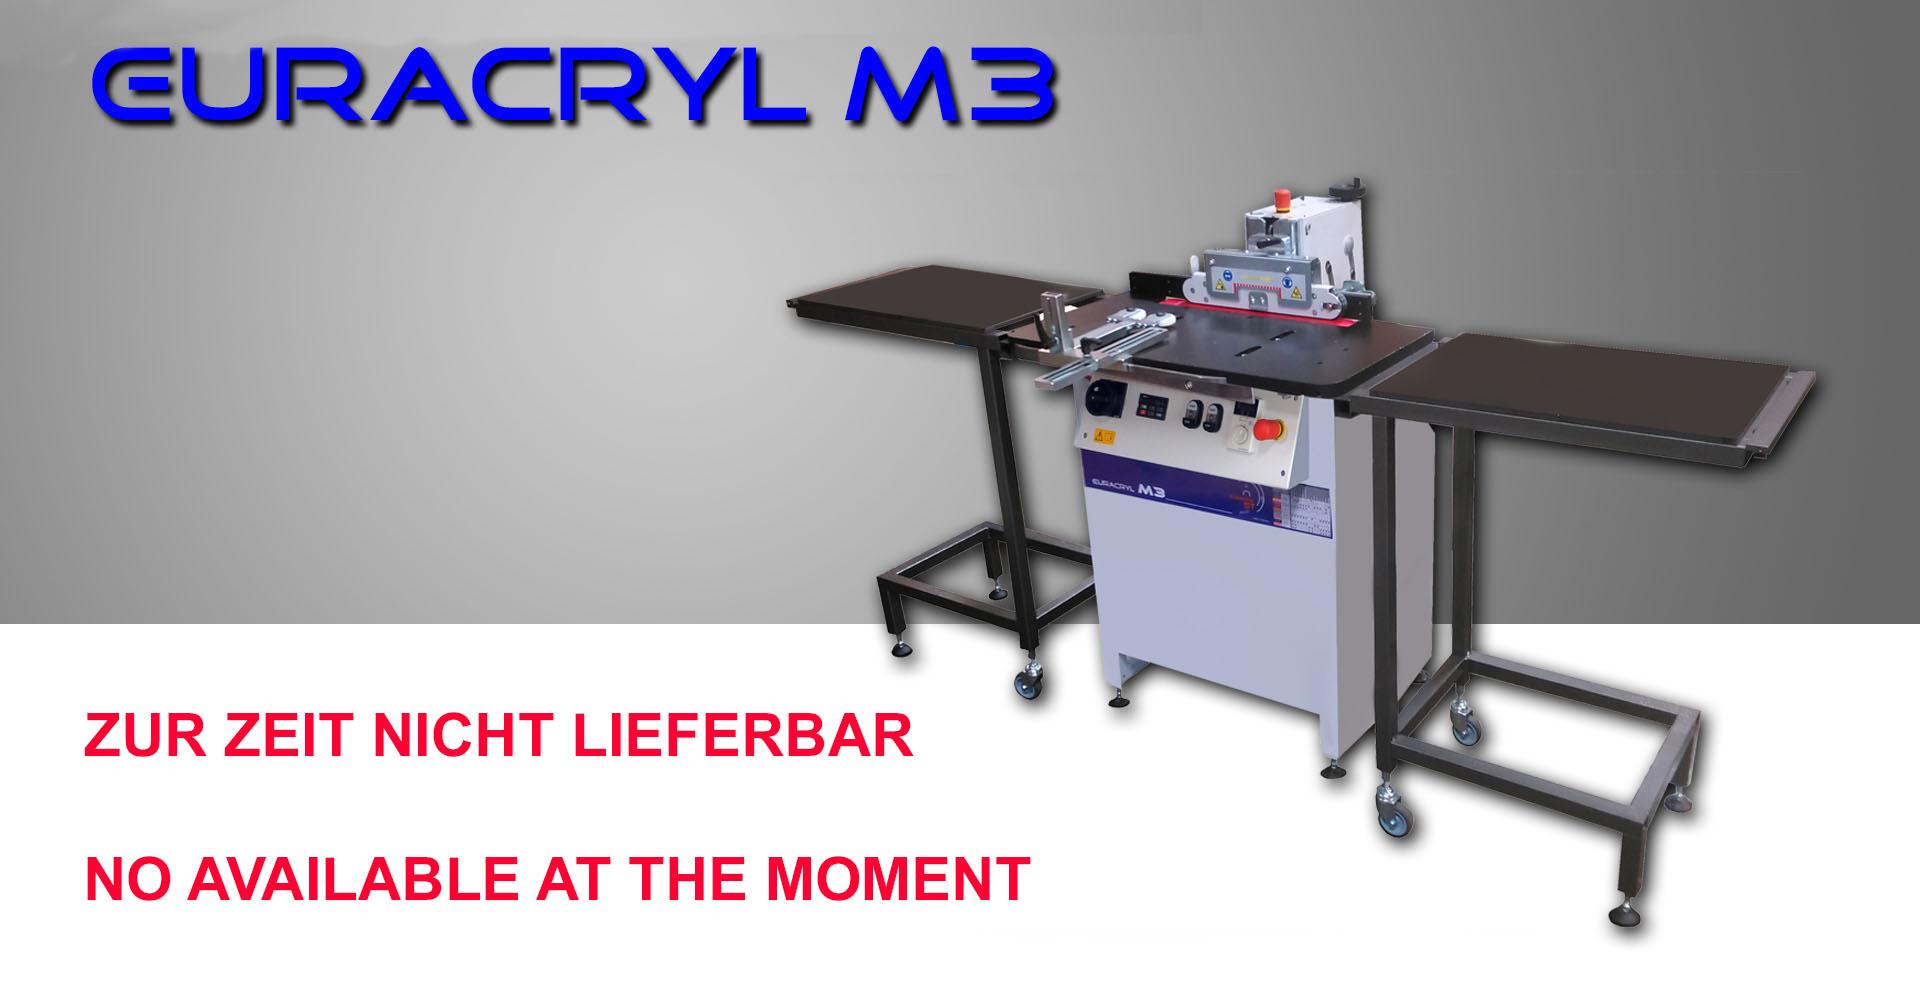 Kantenpoliermaschine M3 euracryl